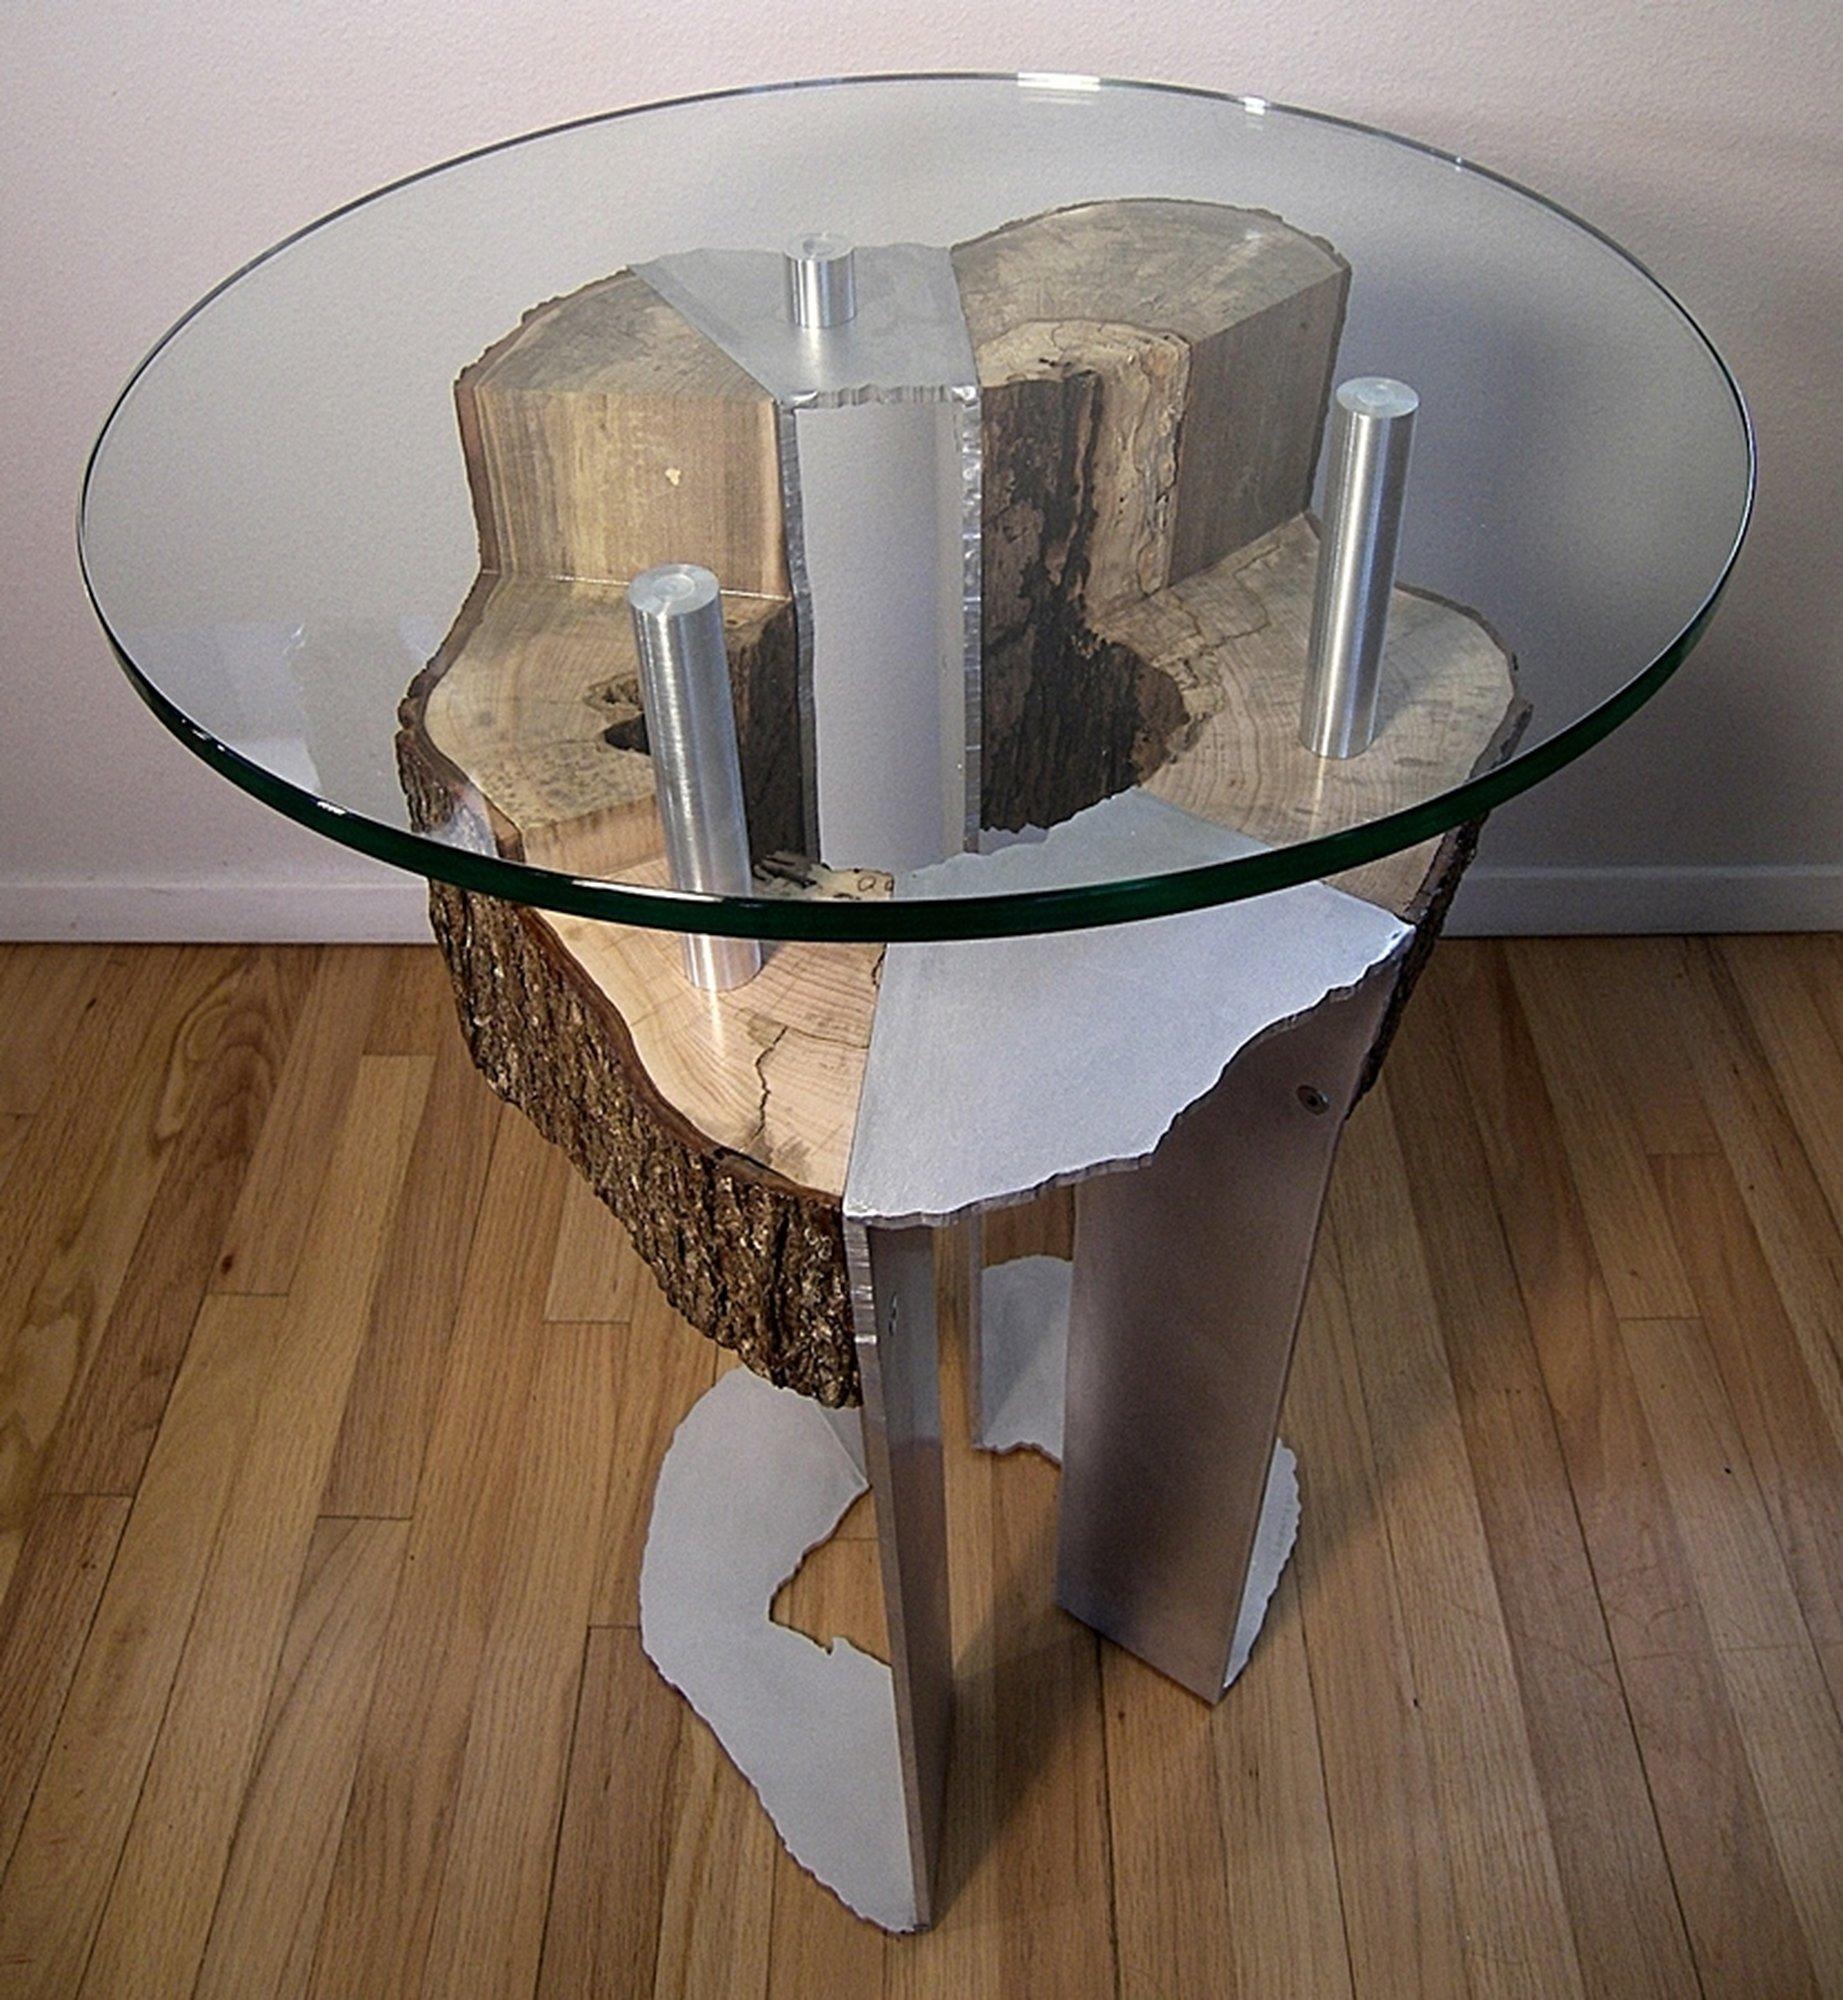 Maple stump table 2